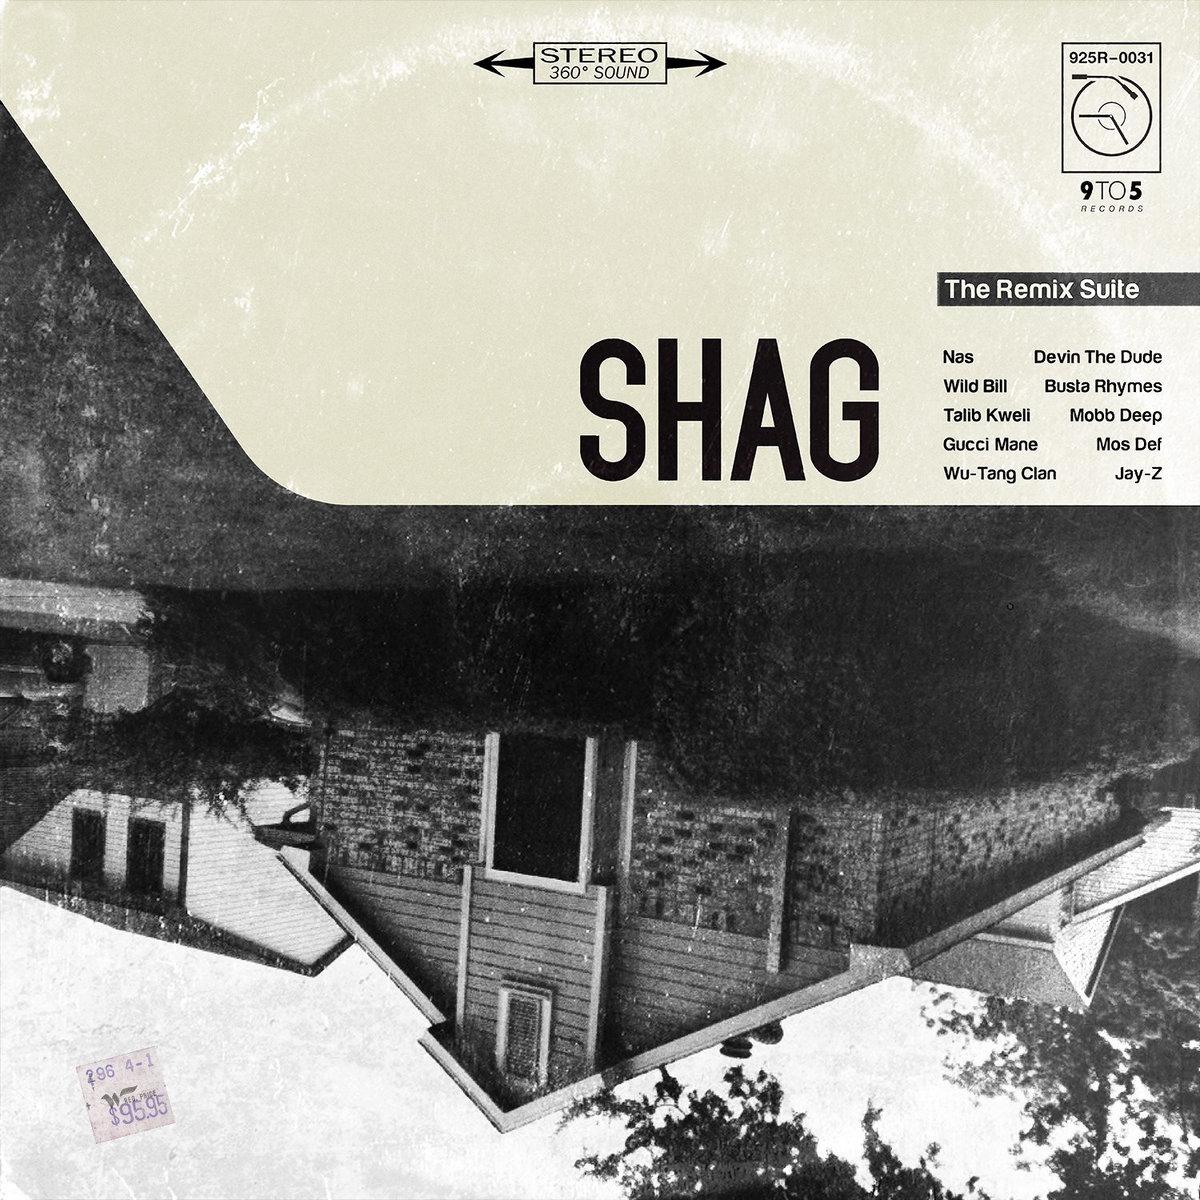 Shag me all night